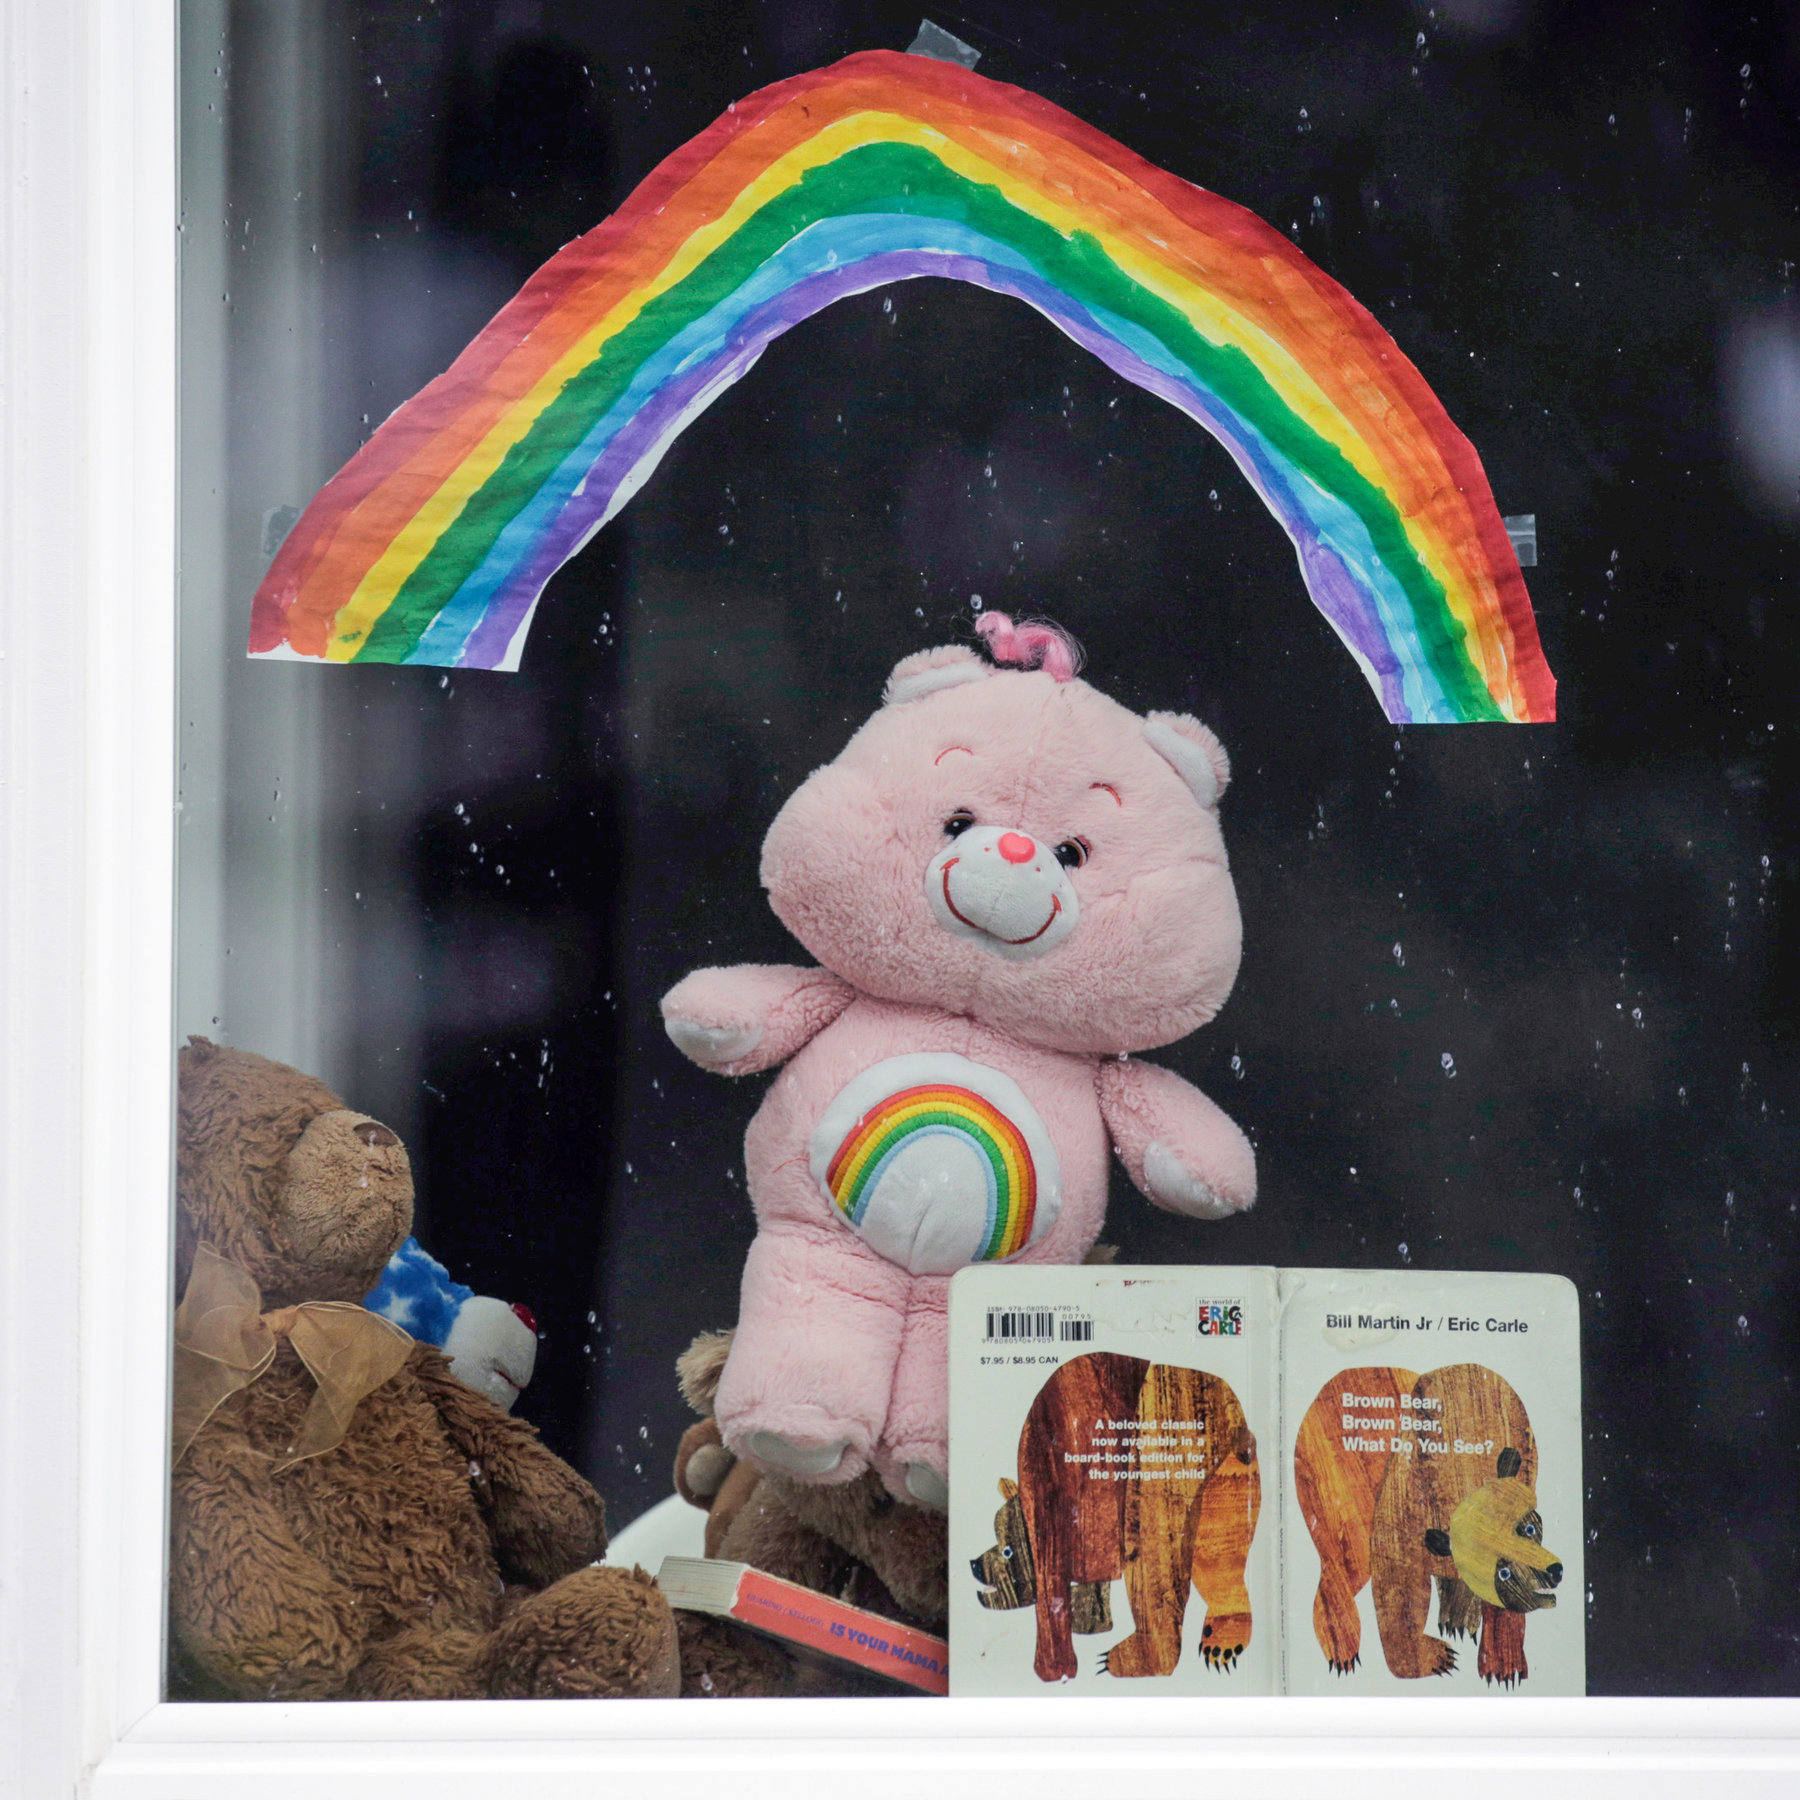 Children Are Hunting Teddy Bears During The Coronavirus Outbreak